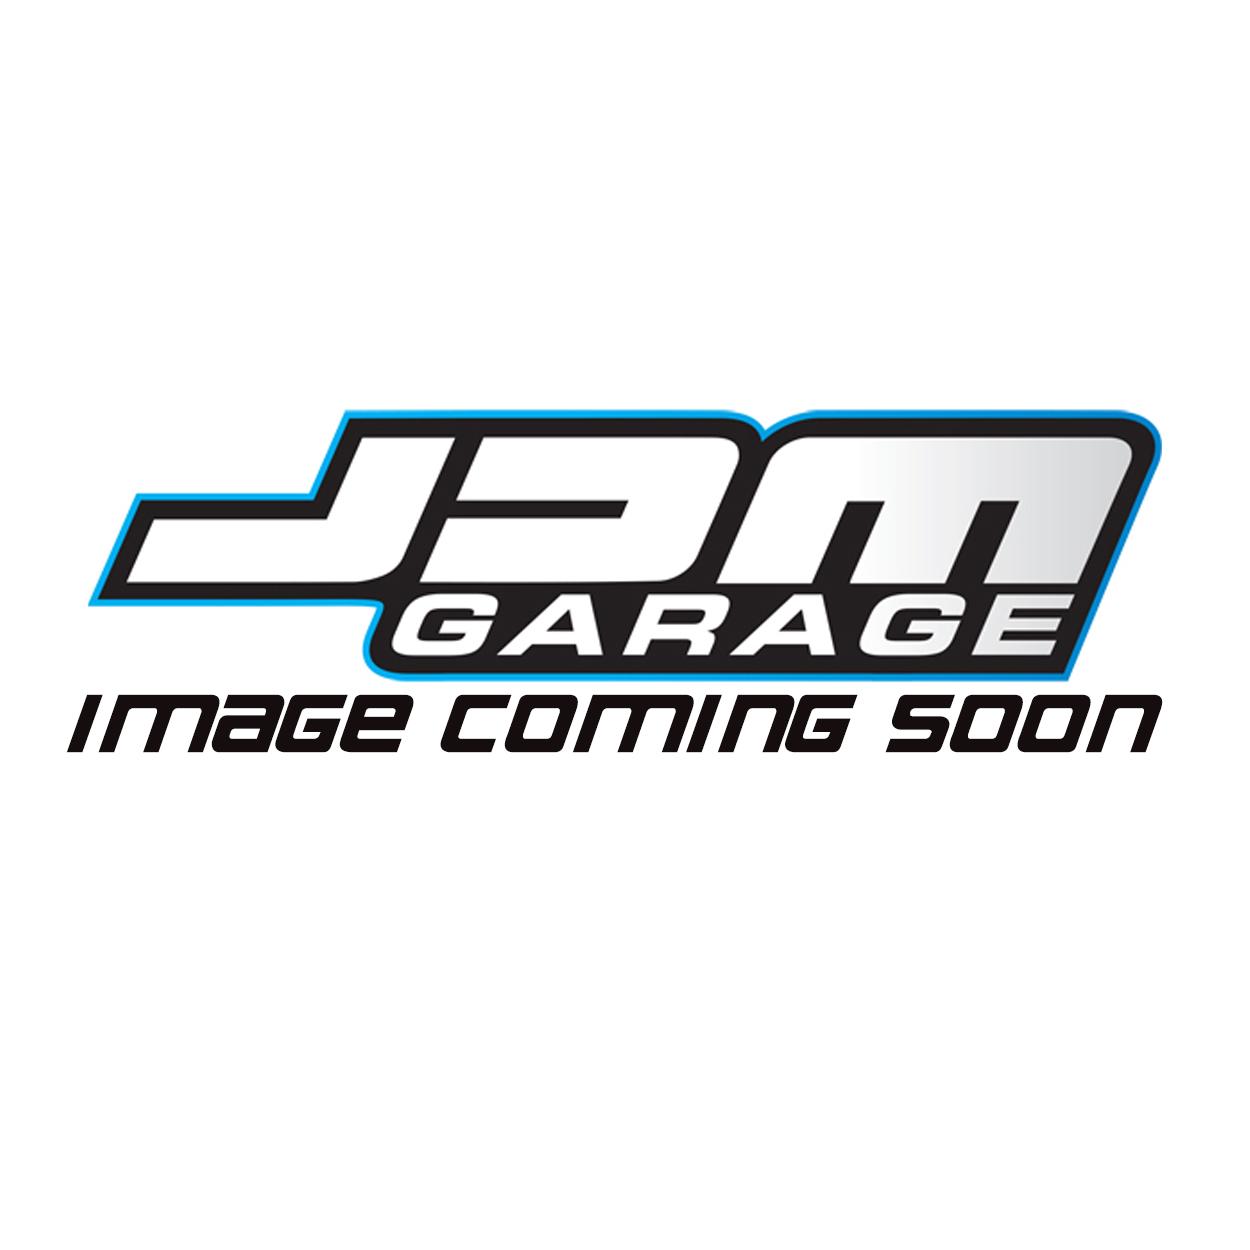 OE Fuel Filter For Subaru Forester S10 S11 / Impreza G10 G11 EJ Engine